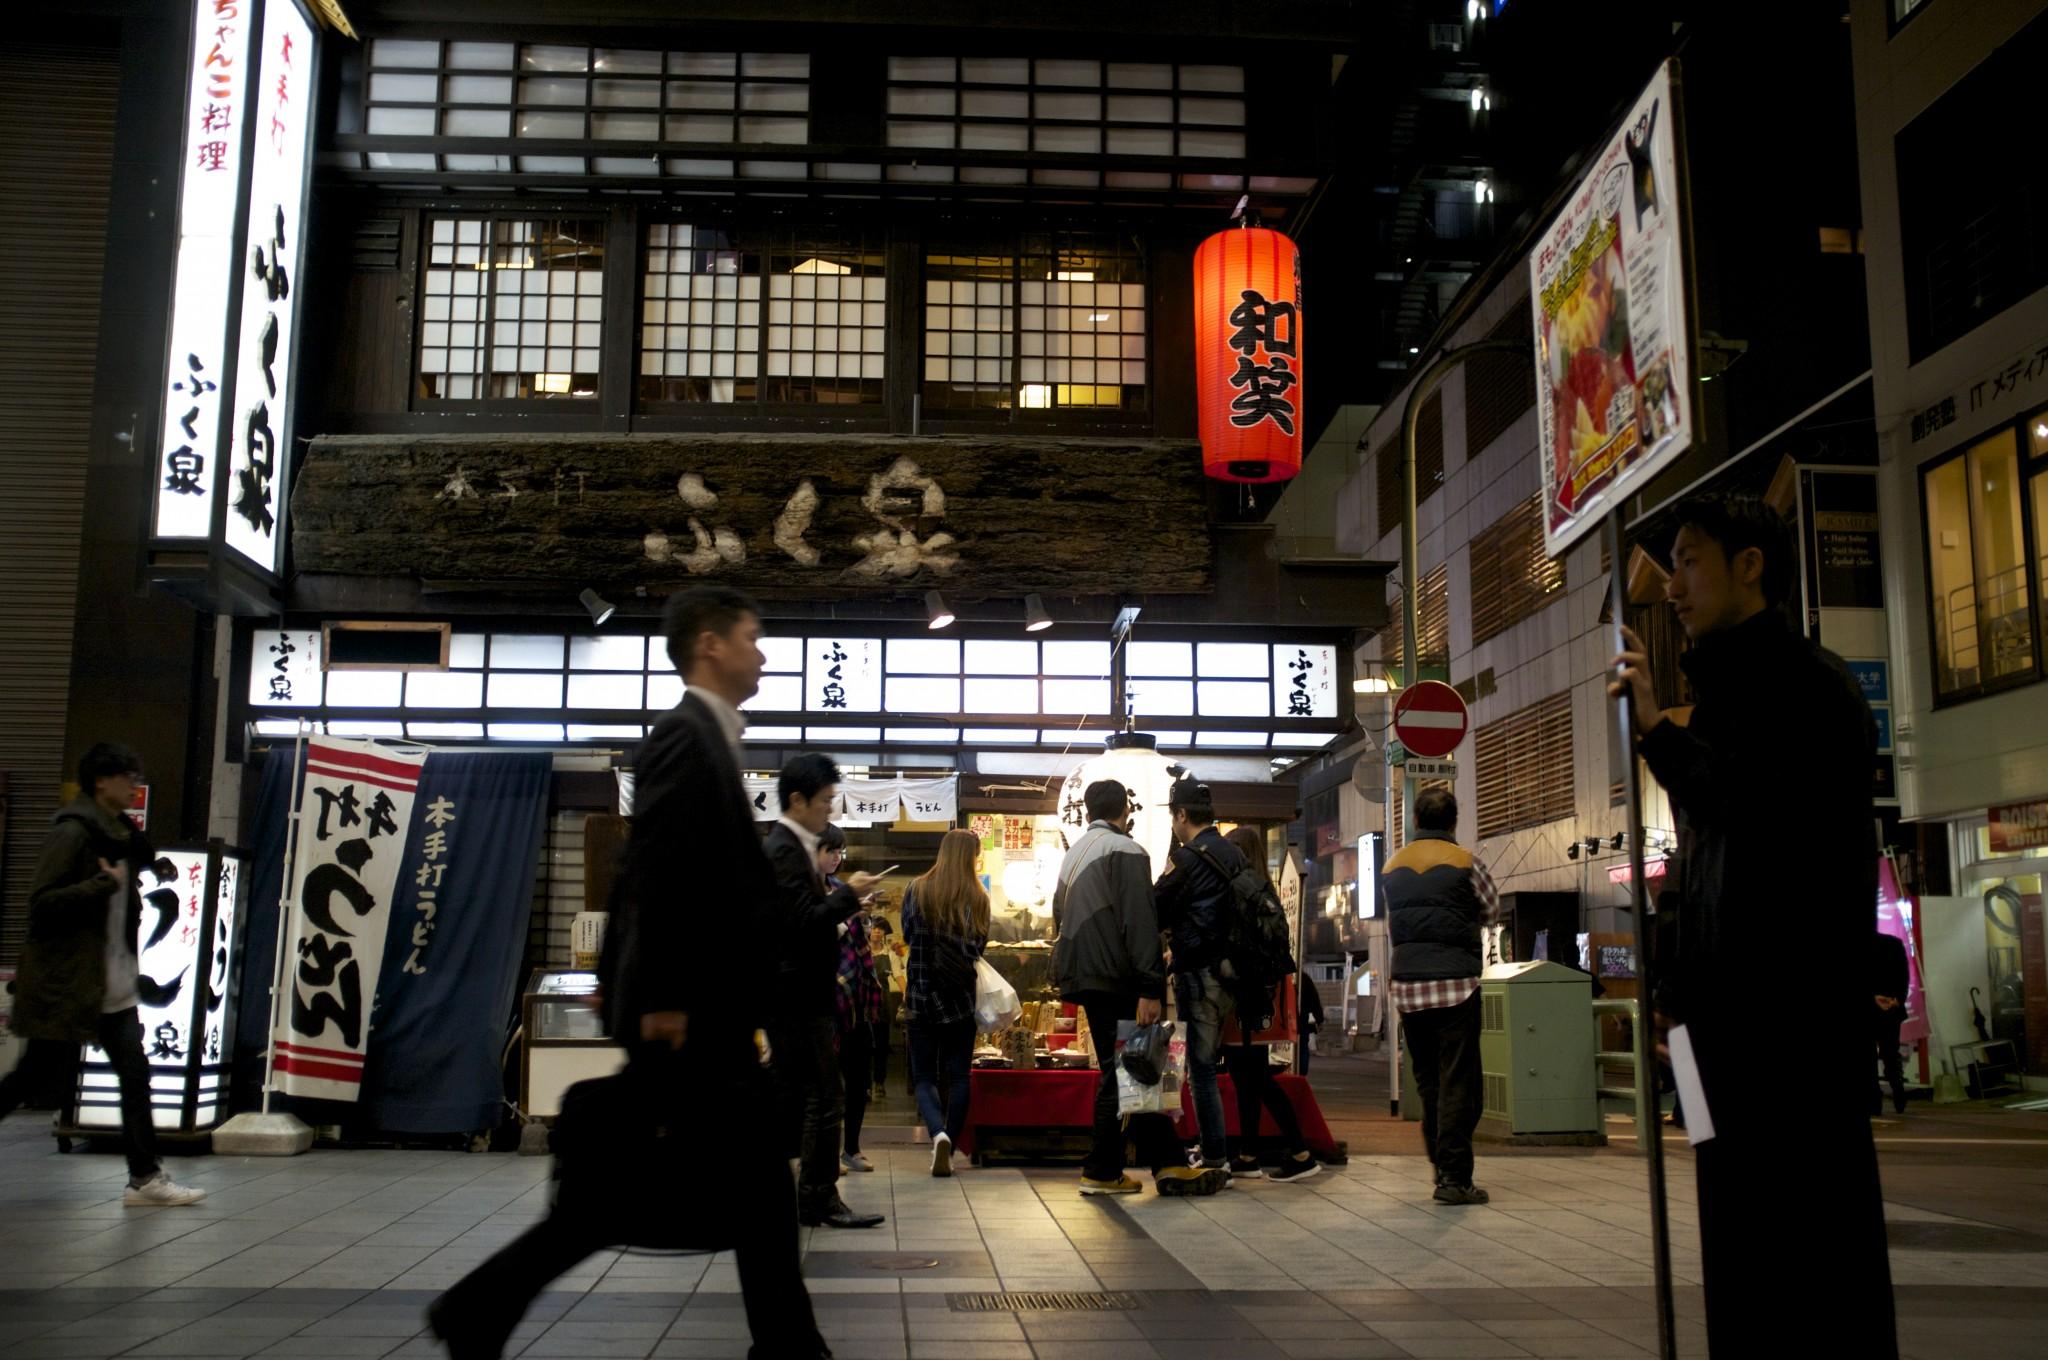 Shimotori: Kumamoto's Southern Shopping Arcade and Gateway to Nightlife